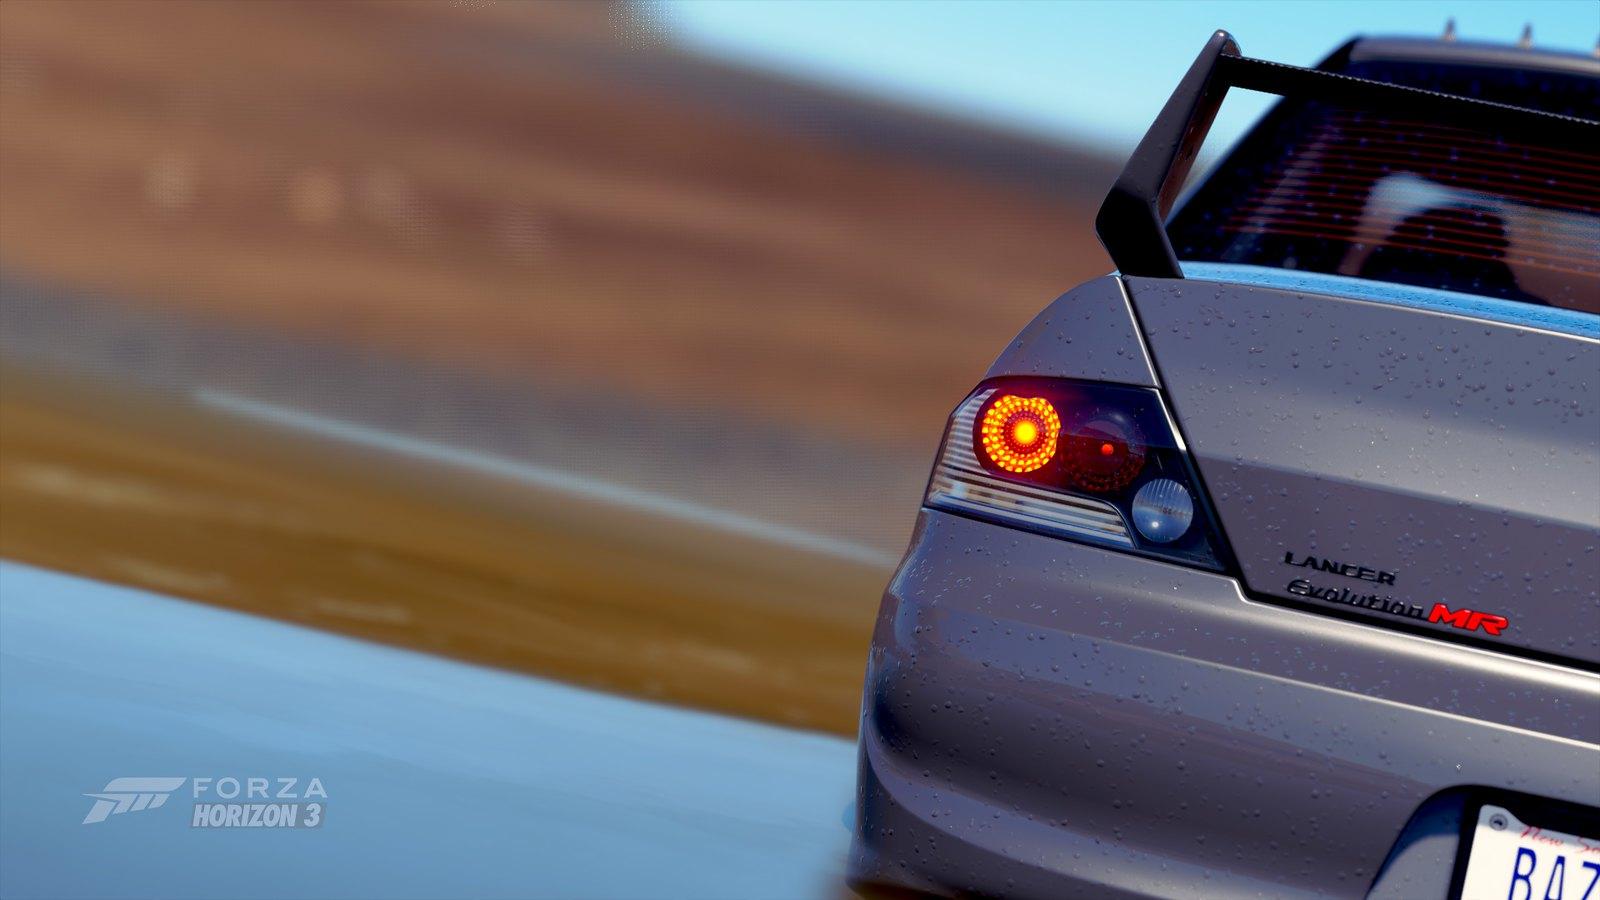 42401599555_f56b626eee_h ForzaMotorsport.fr